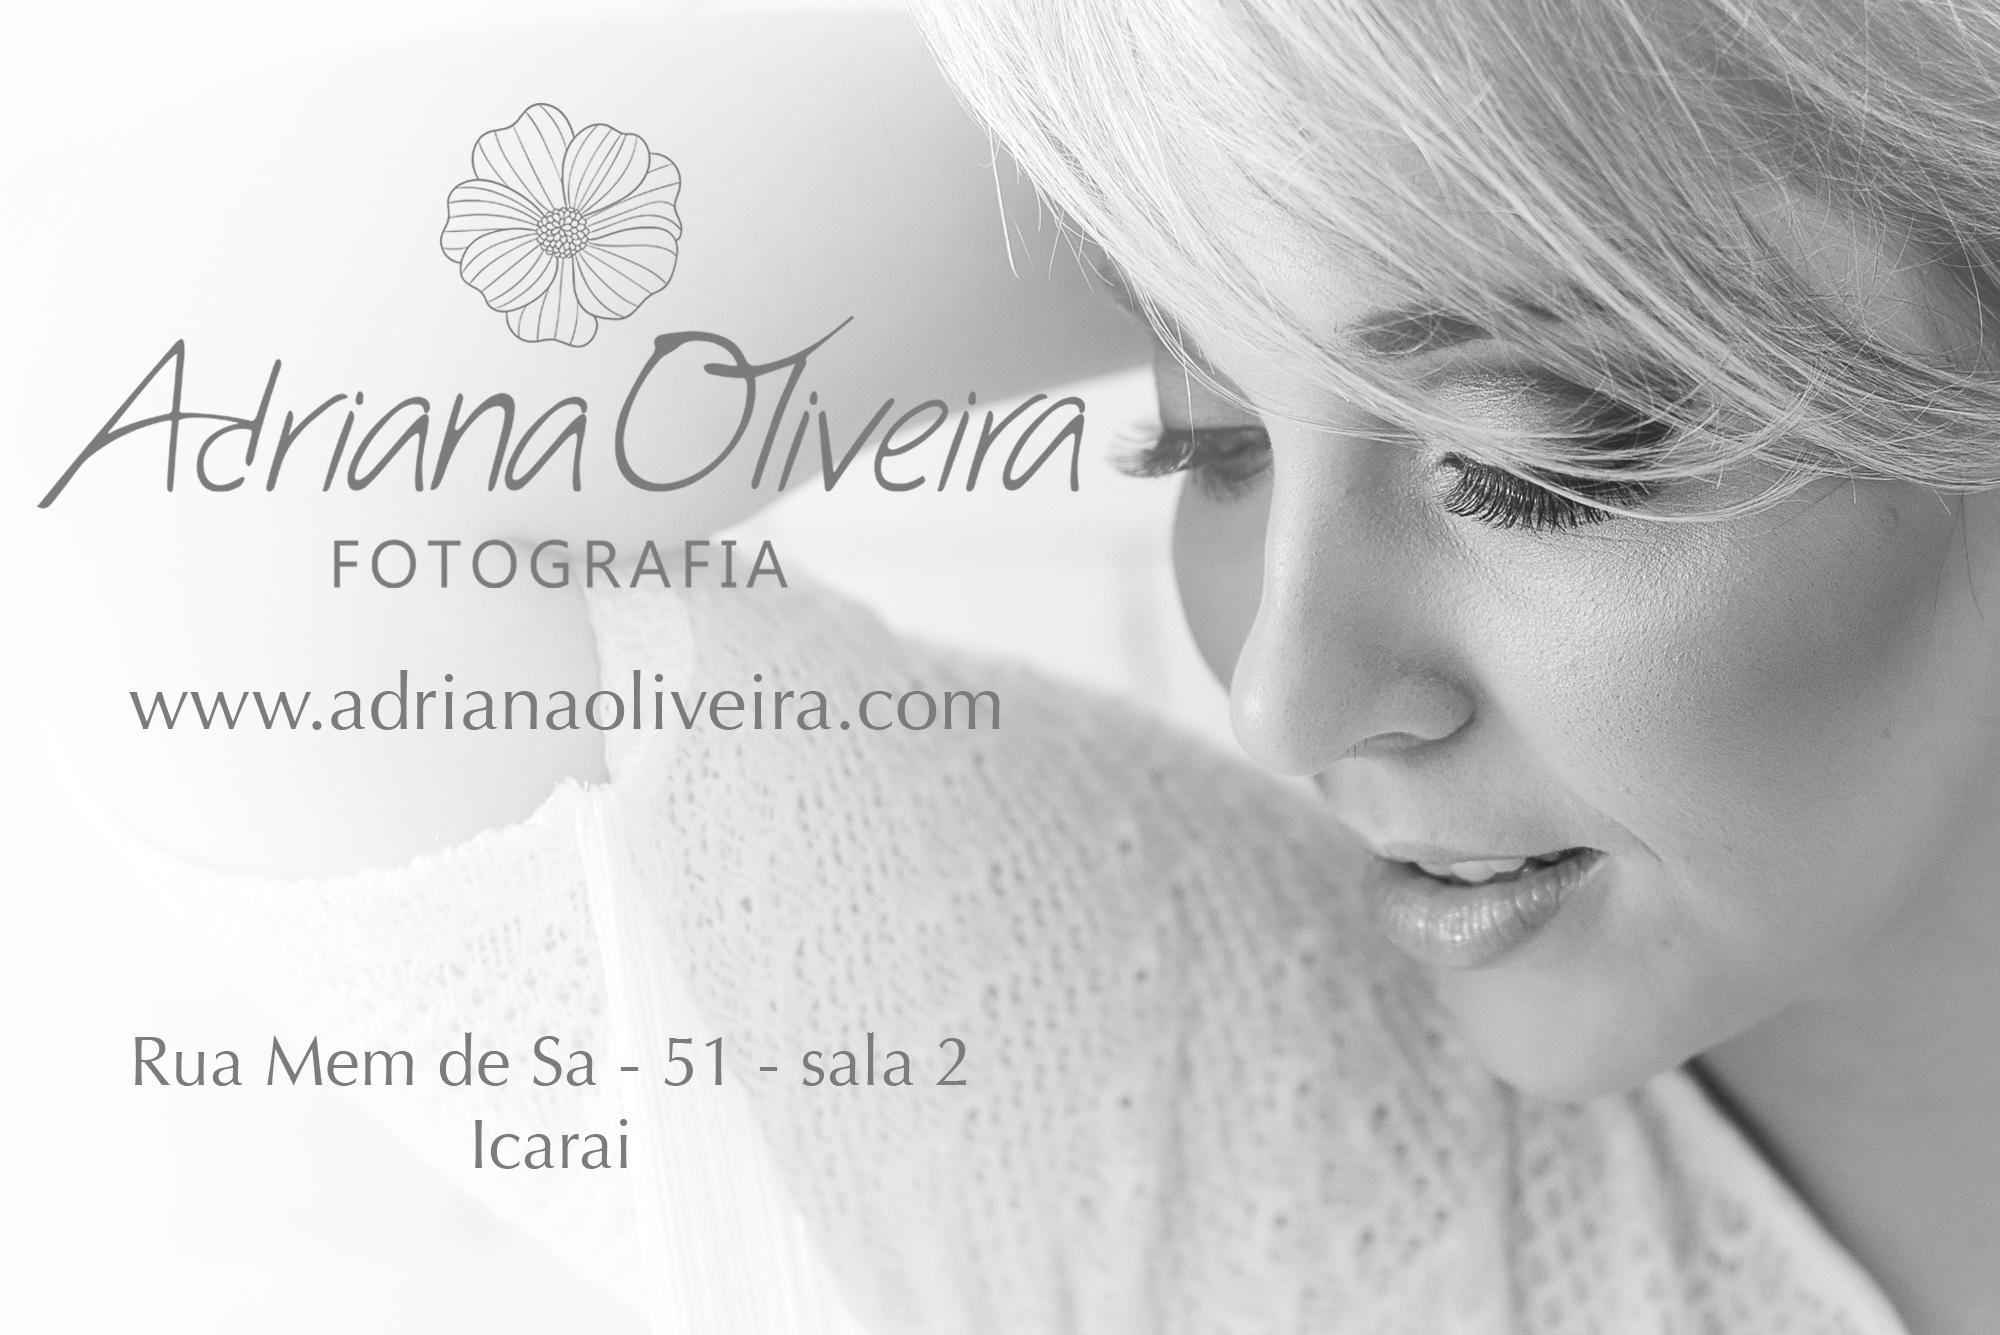 Contate Adriana Oliveira fotografia